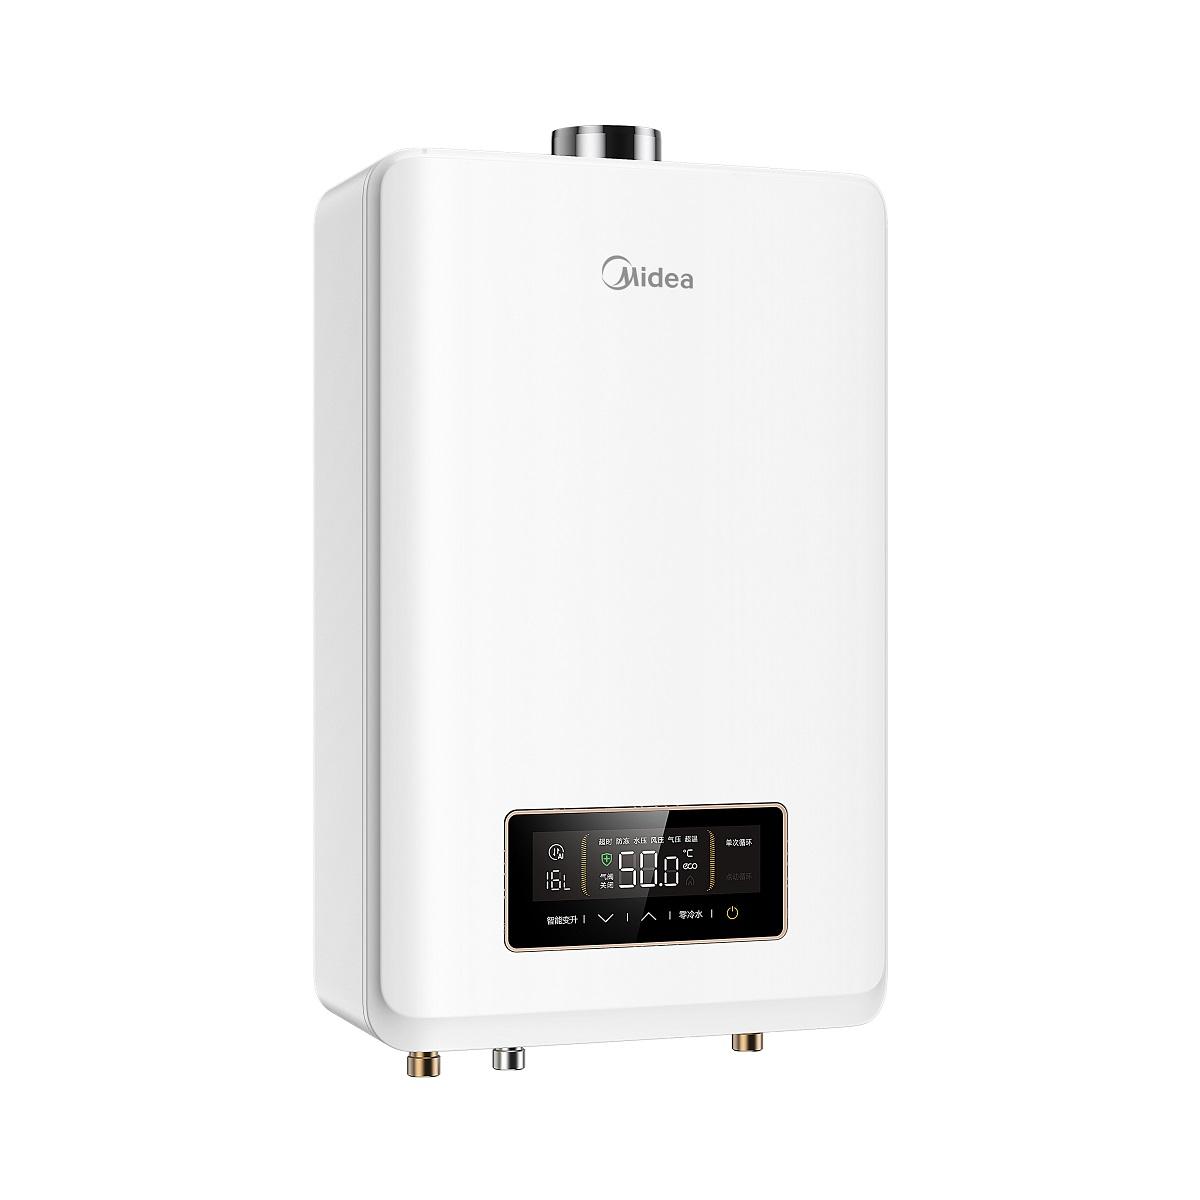 Midea/美的 JSQ25-13HP7燃气热水器 说明书.pdf